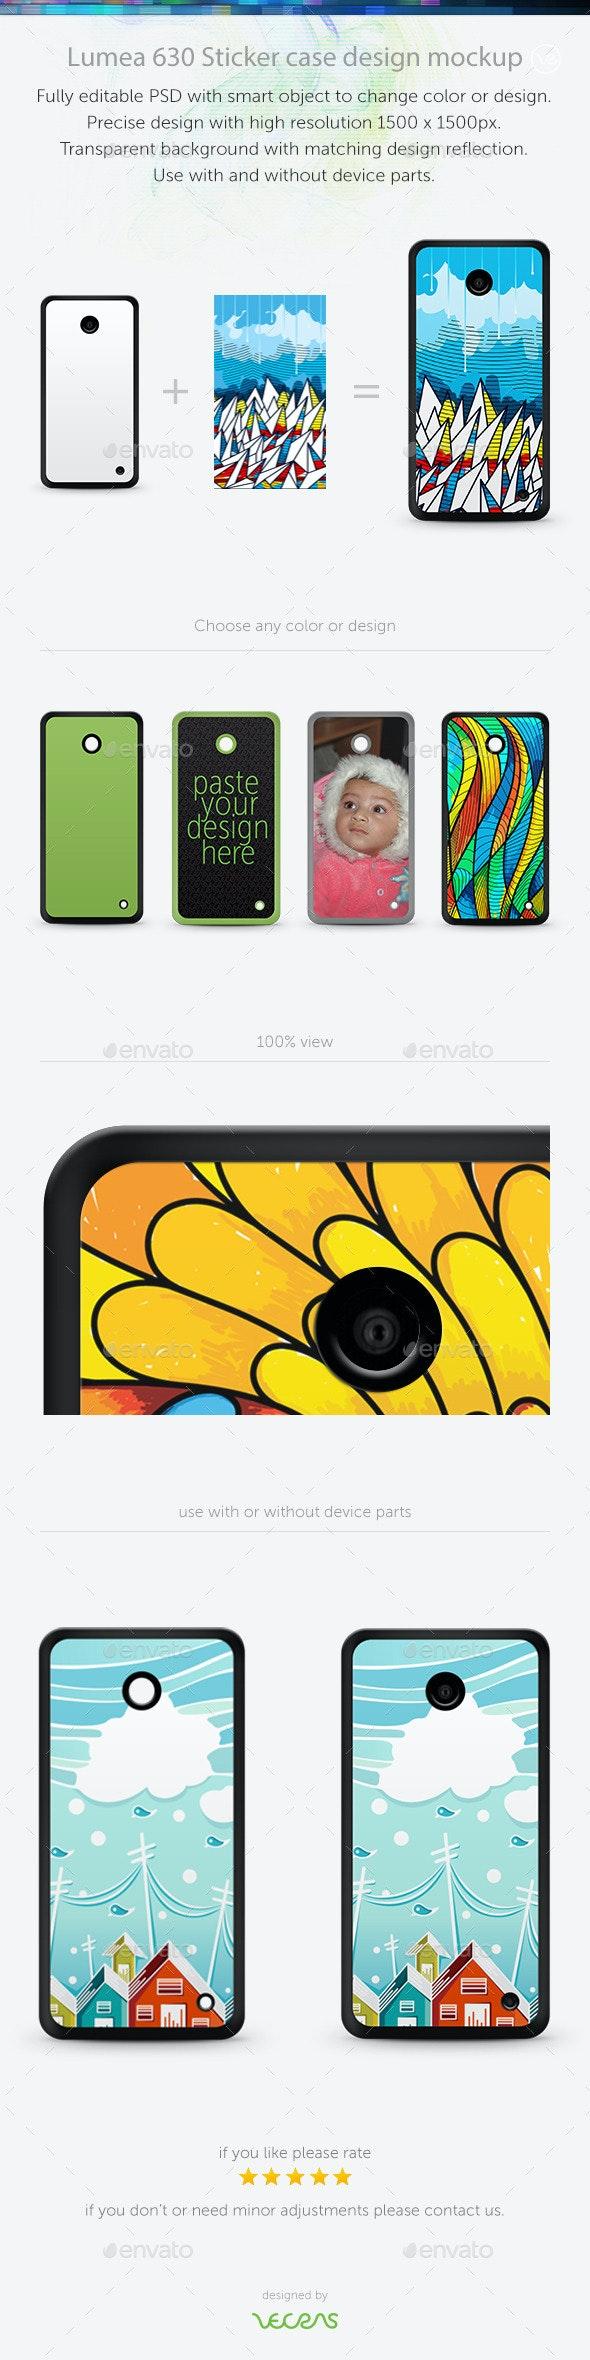 Lumea 630 Sticker Case Design Mockup - Mobile Displays